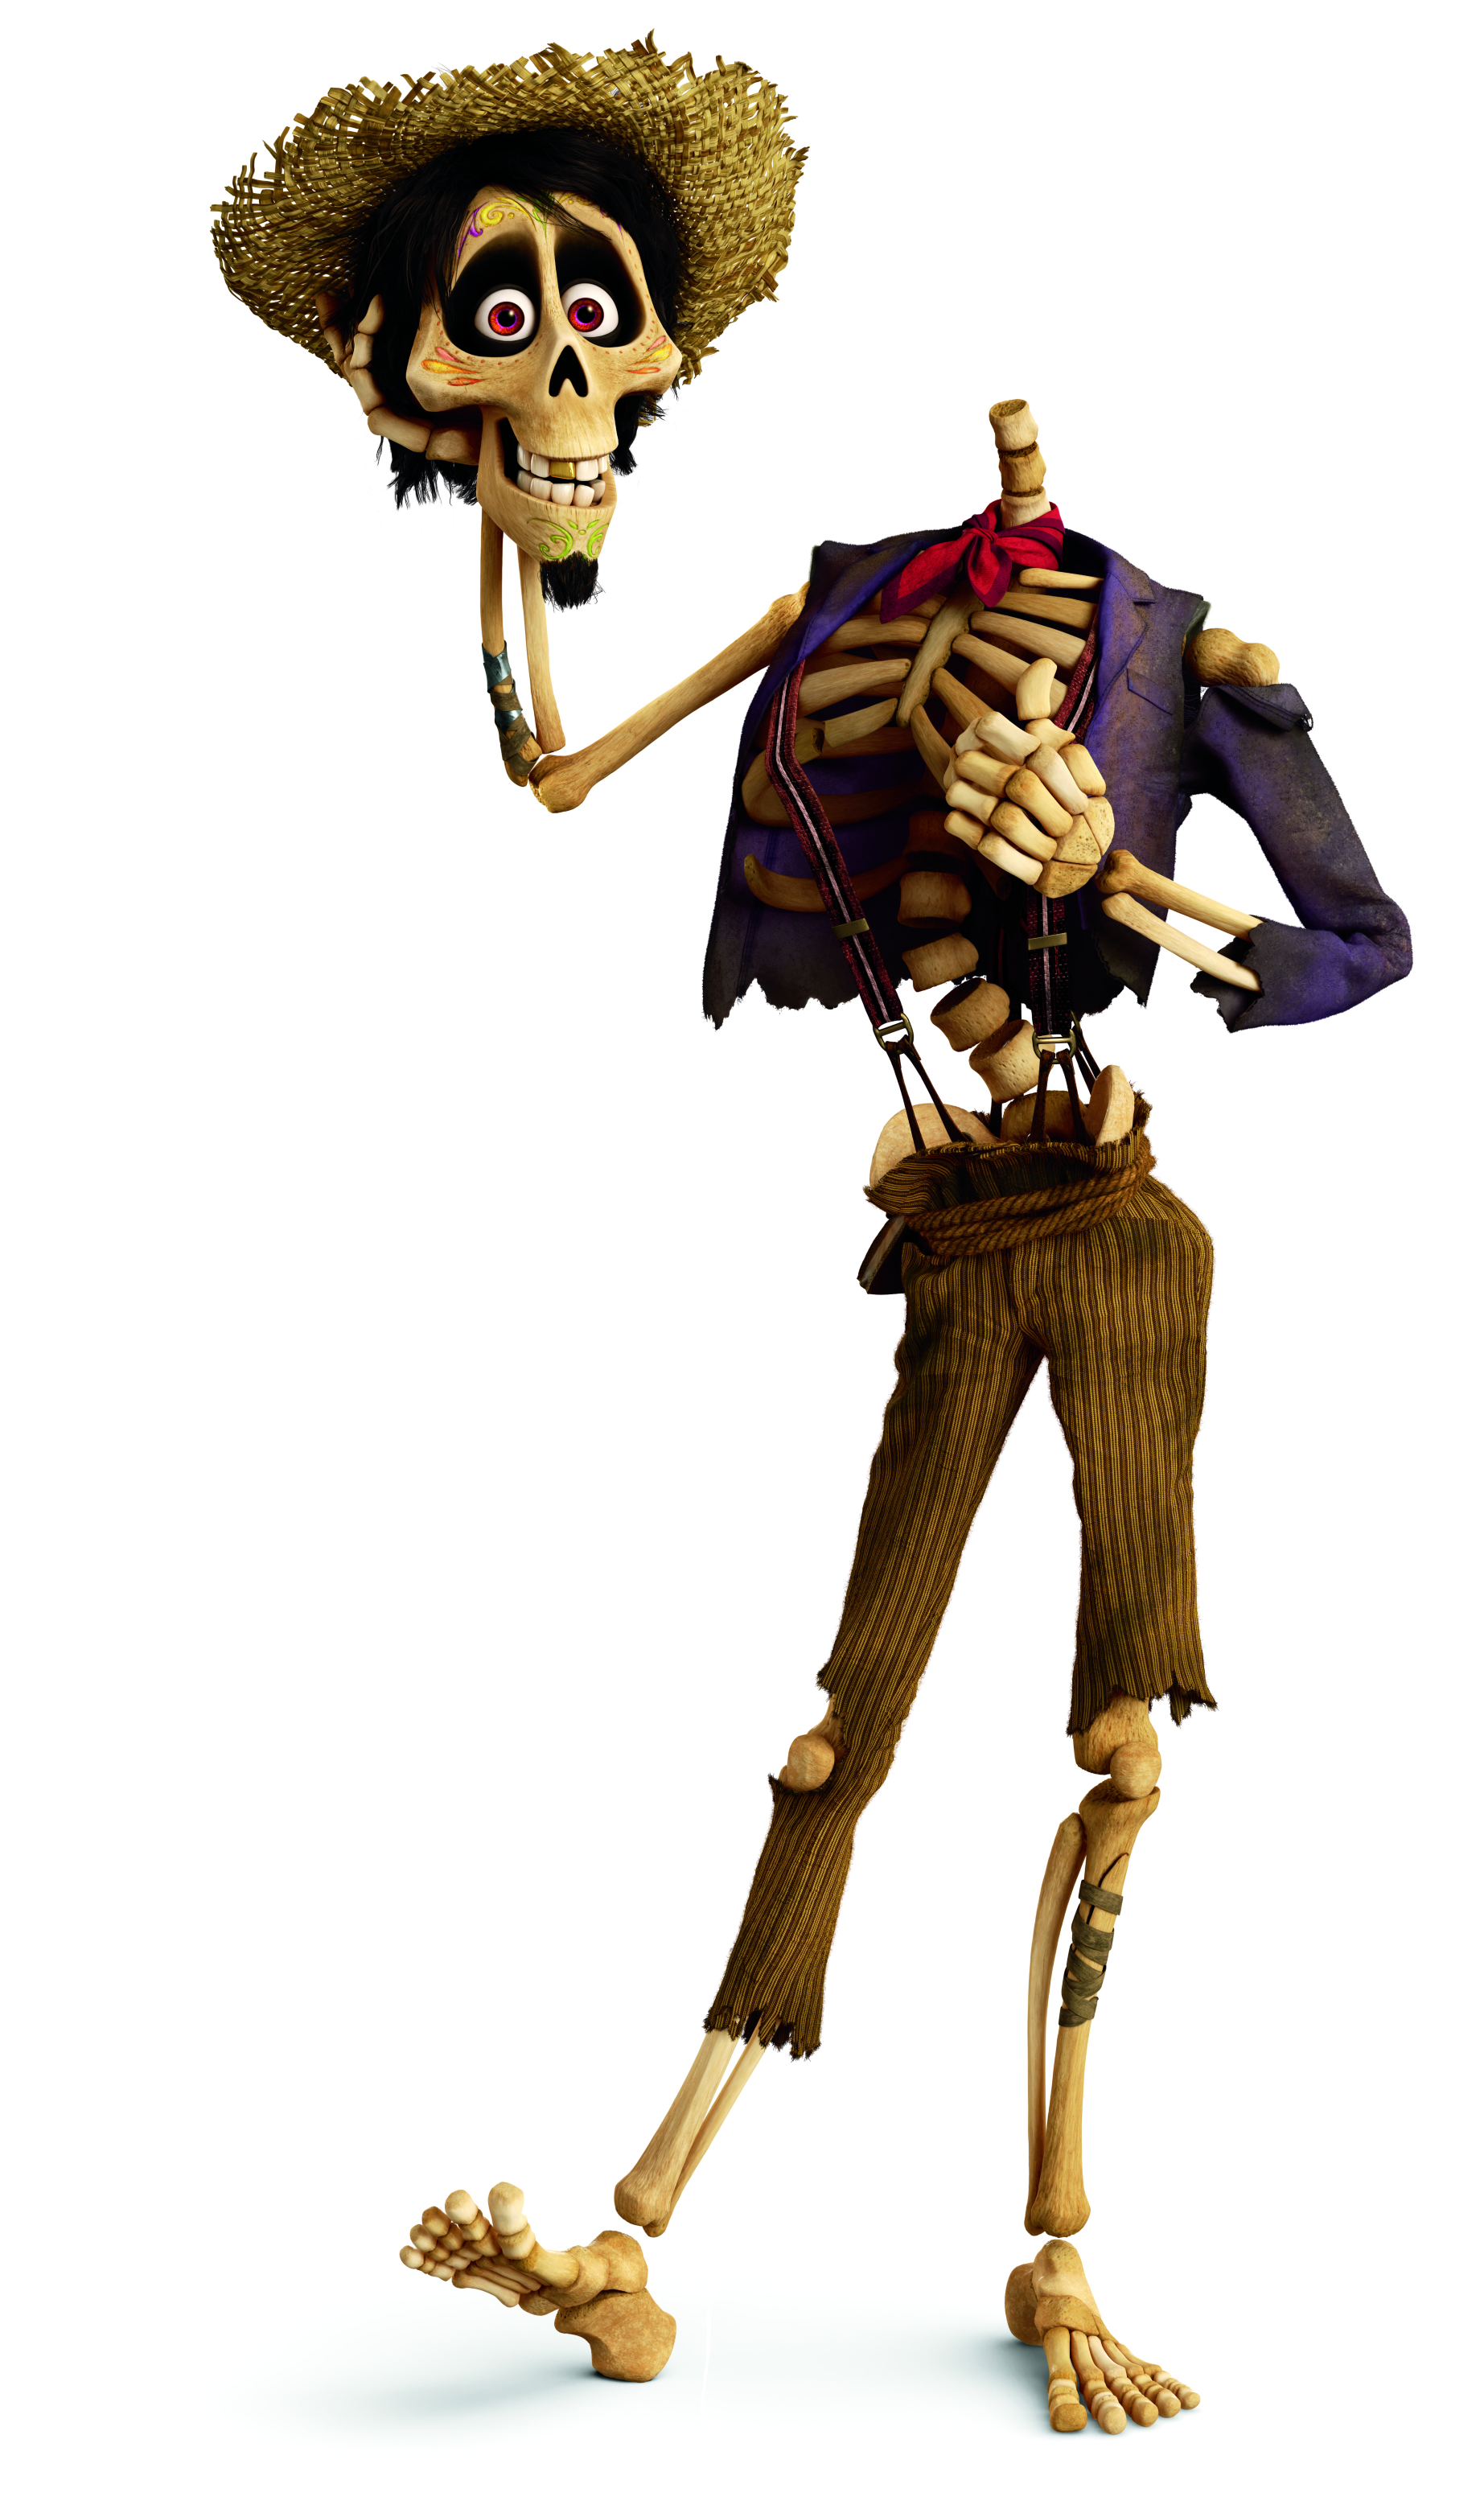 image coco headless hector png disney wiki fandom powered by wikia Giraffe Skeleton Snake Skeleton